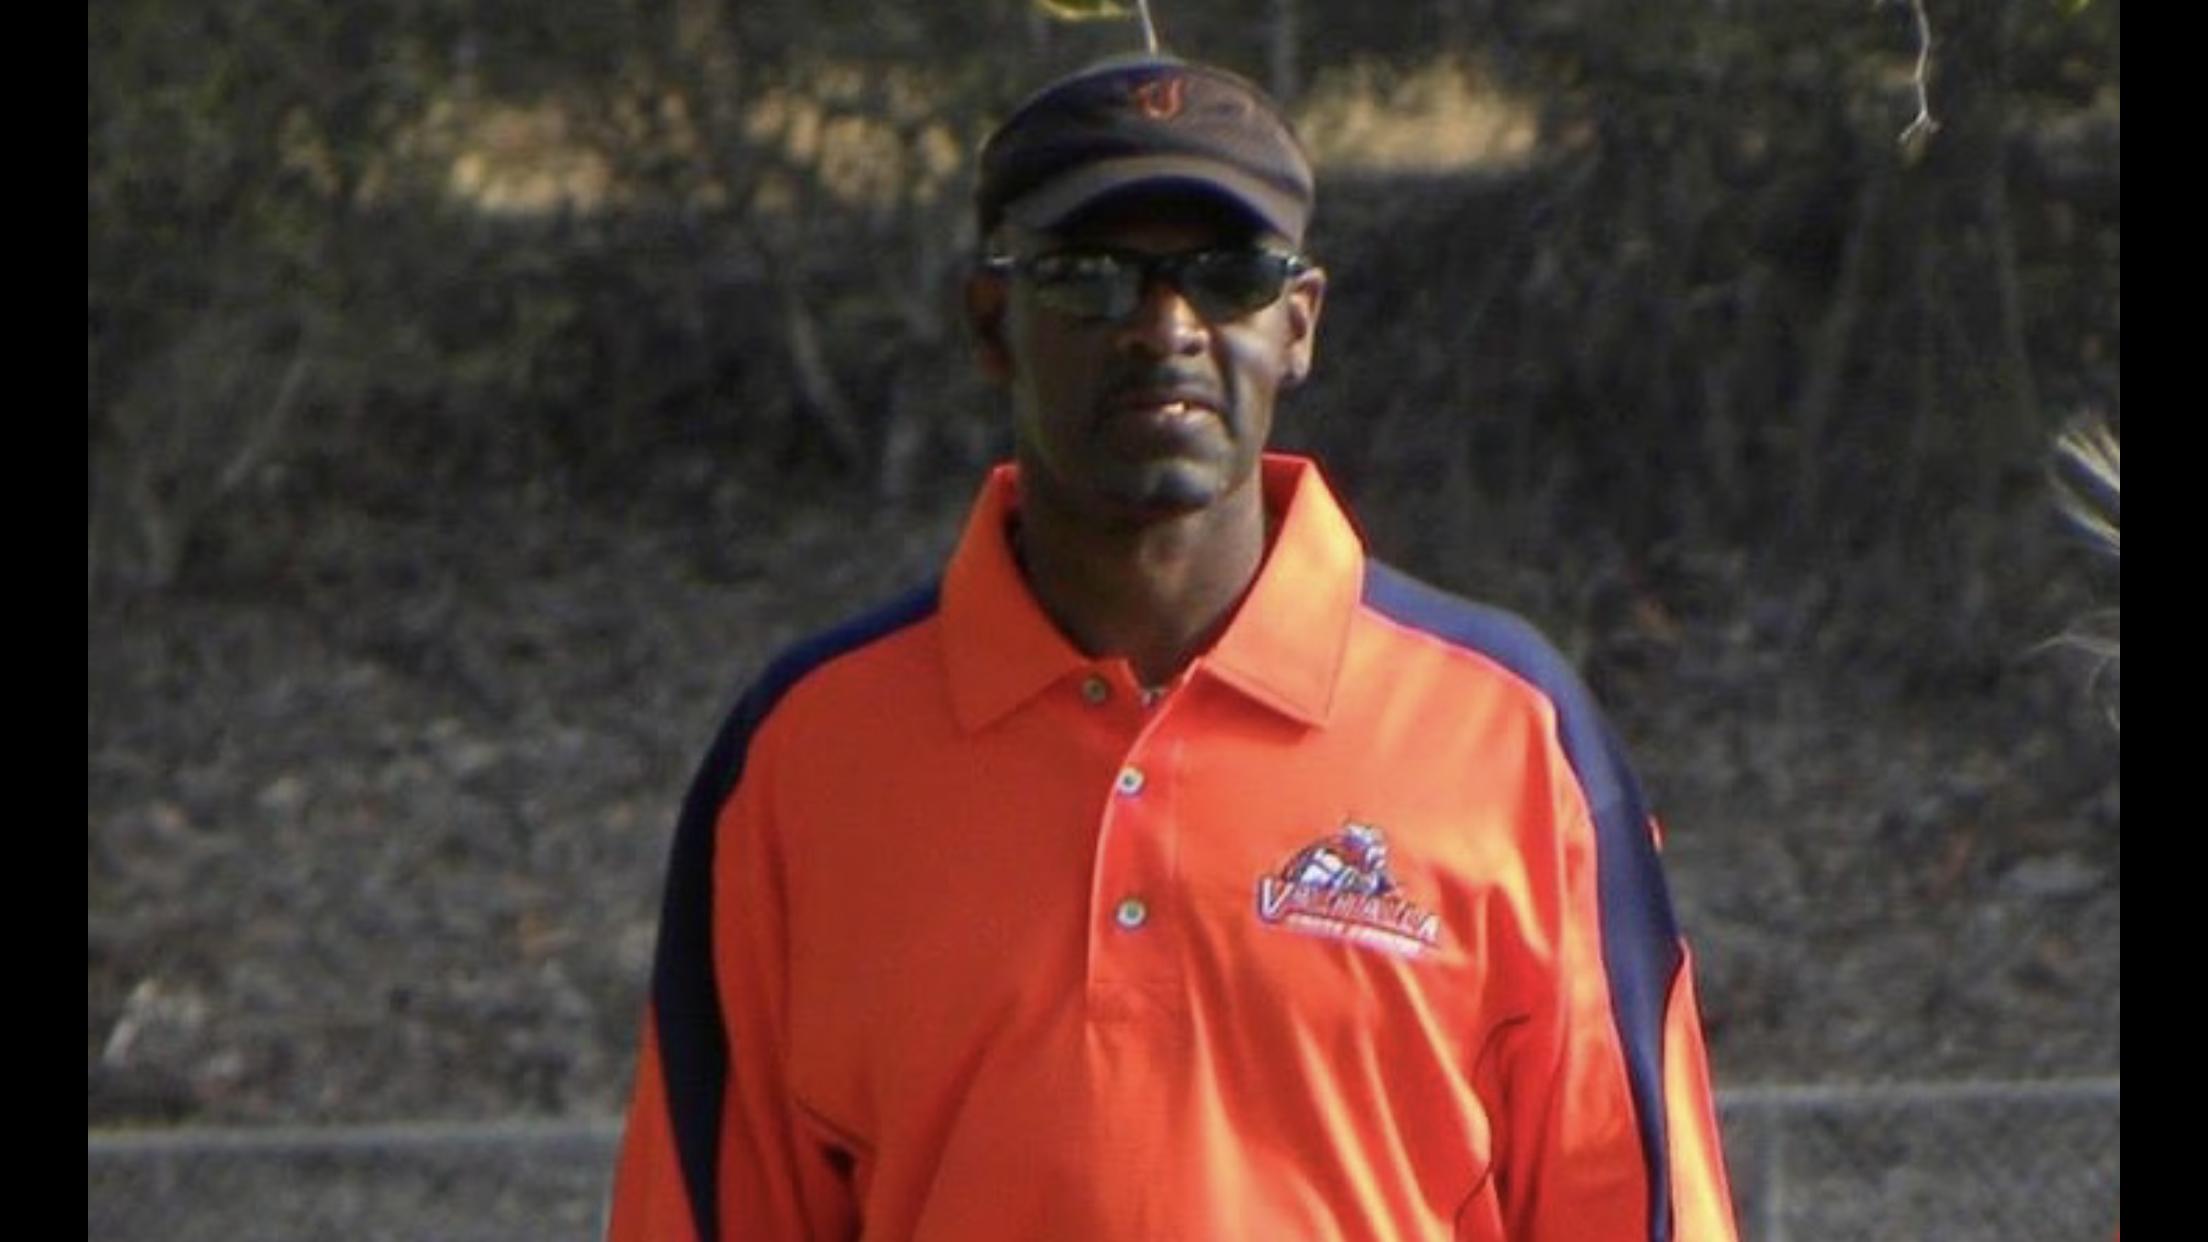 Memorial Mile for Coach Carter Yarborough